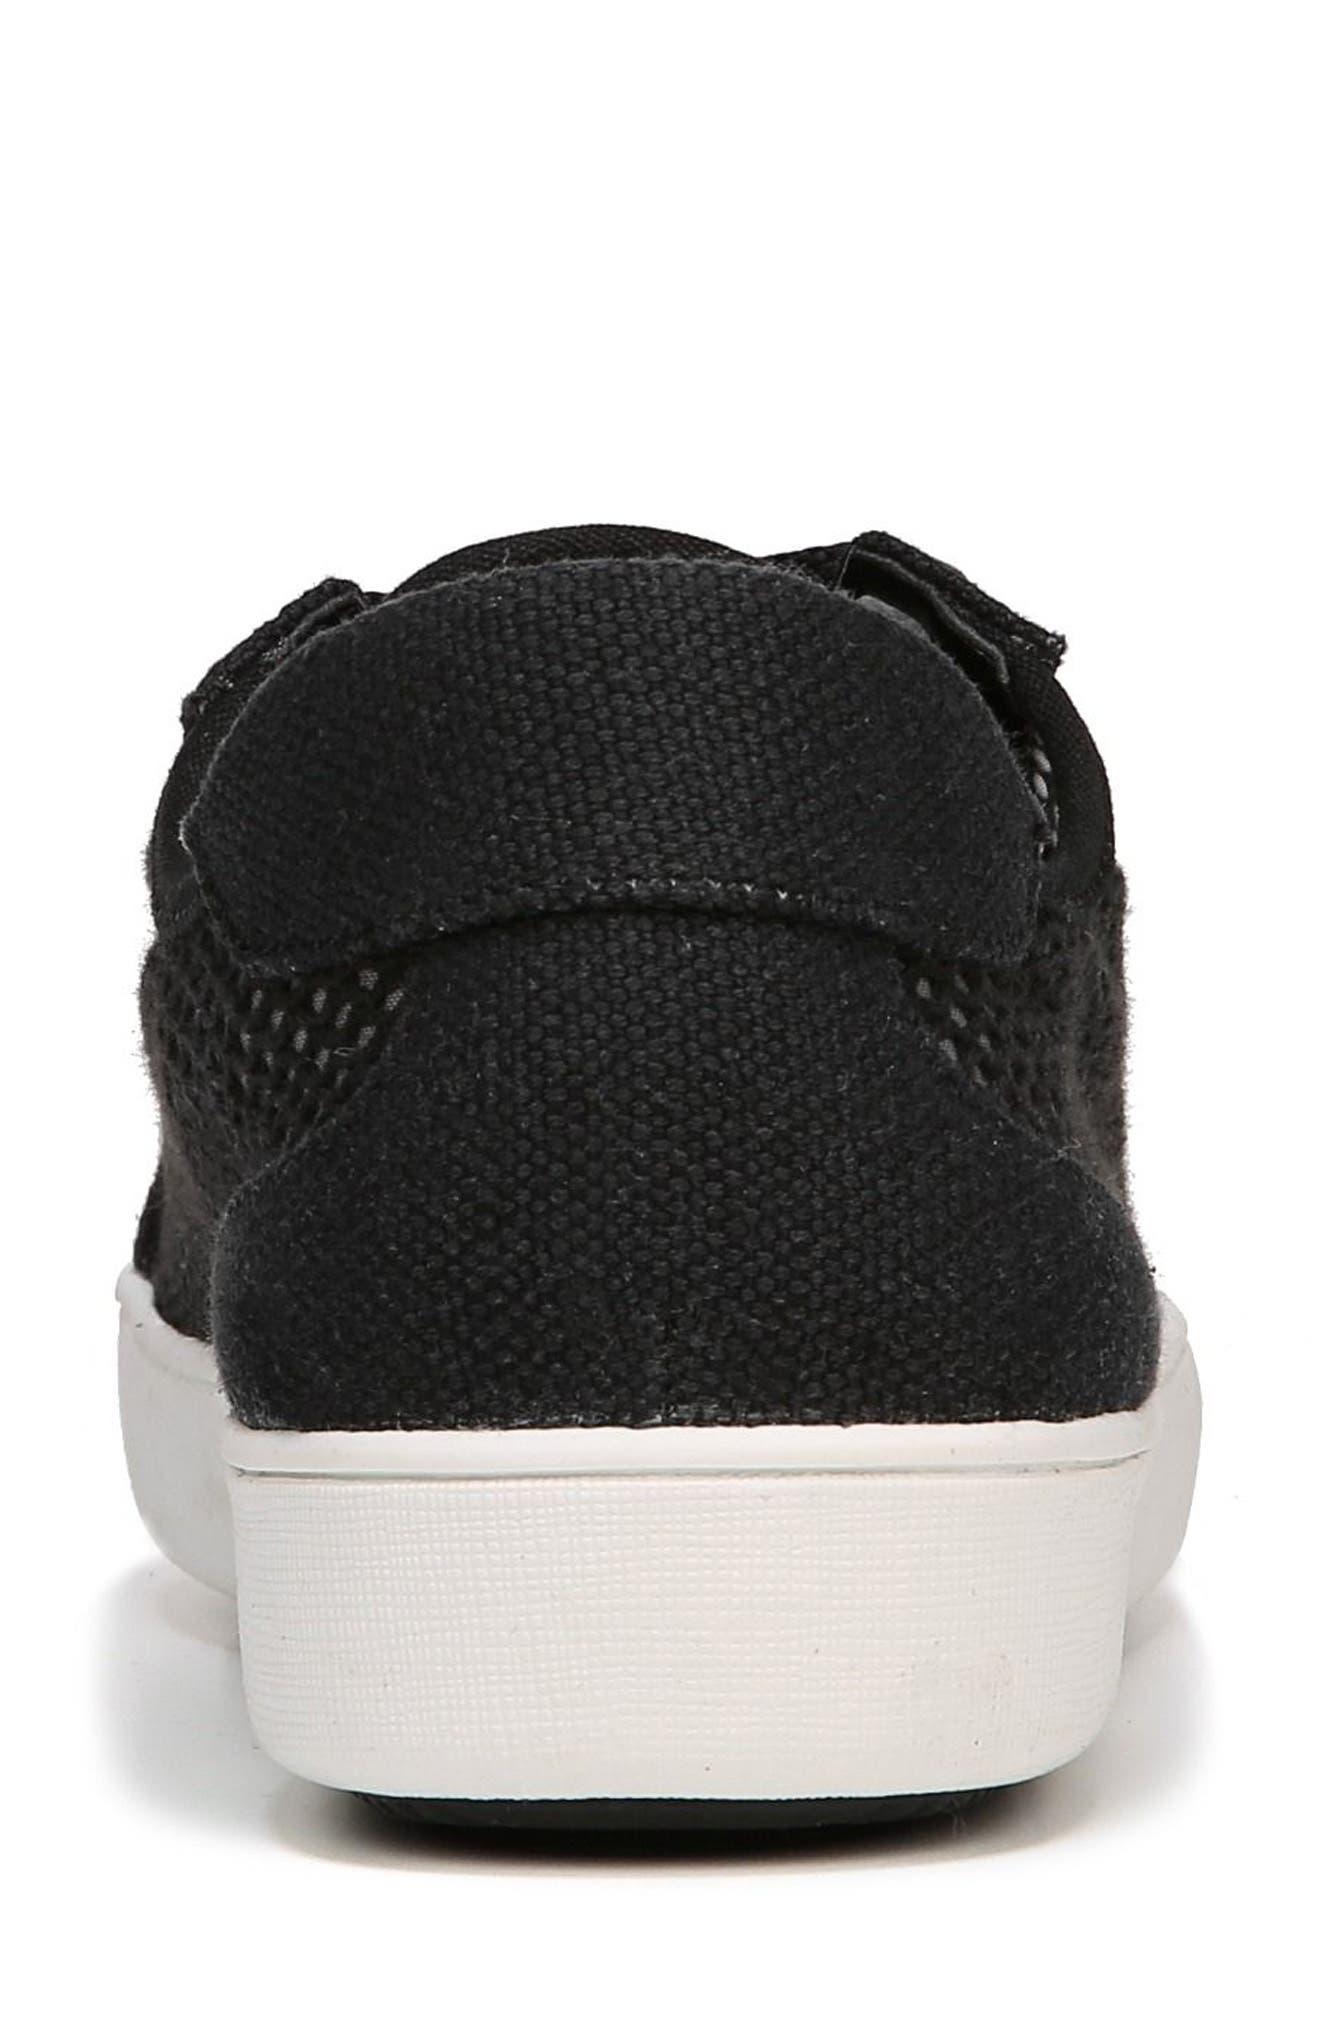 Morrison III Perforated Sneaker,                             Alternate thumbnail 7, color,                             BLACK FABRIC